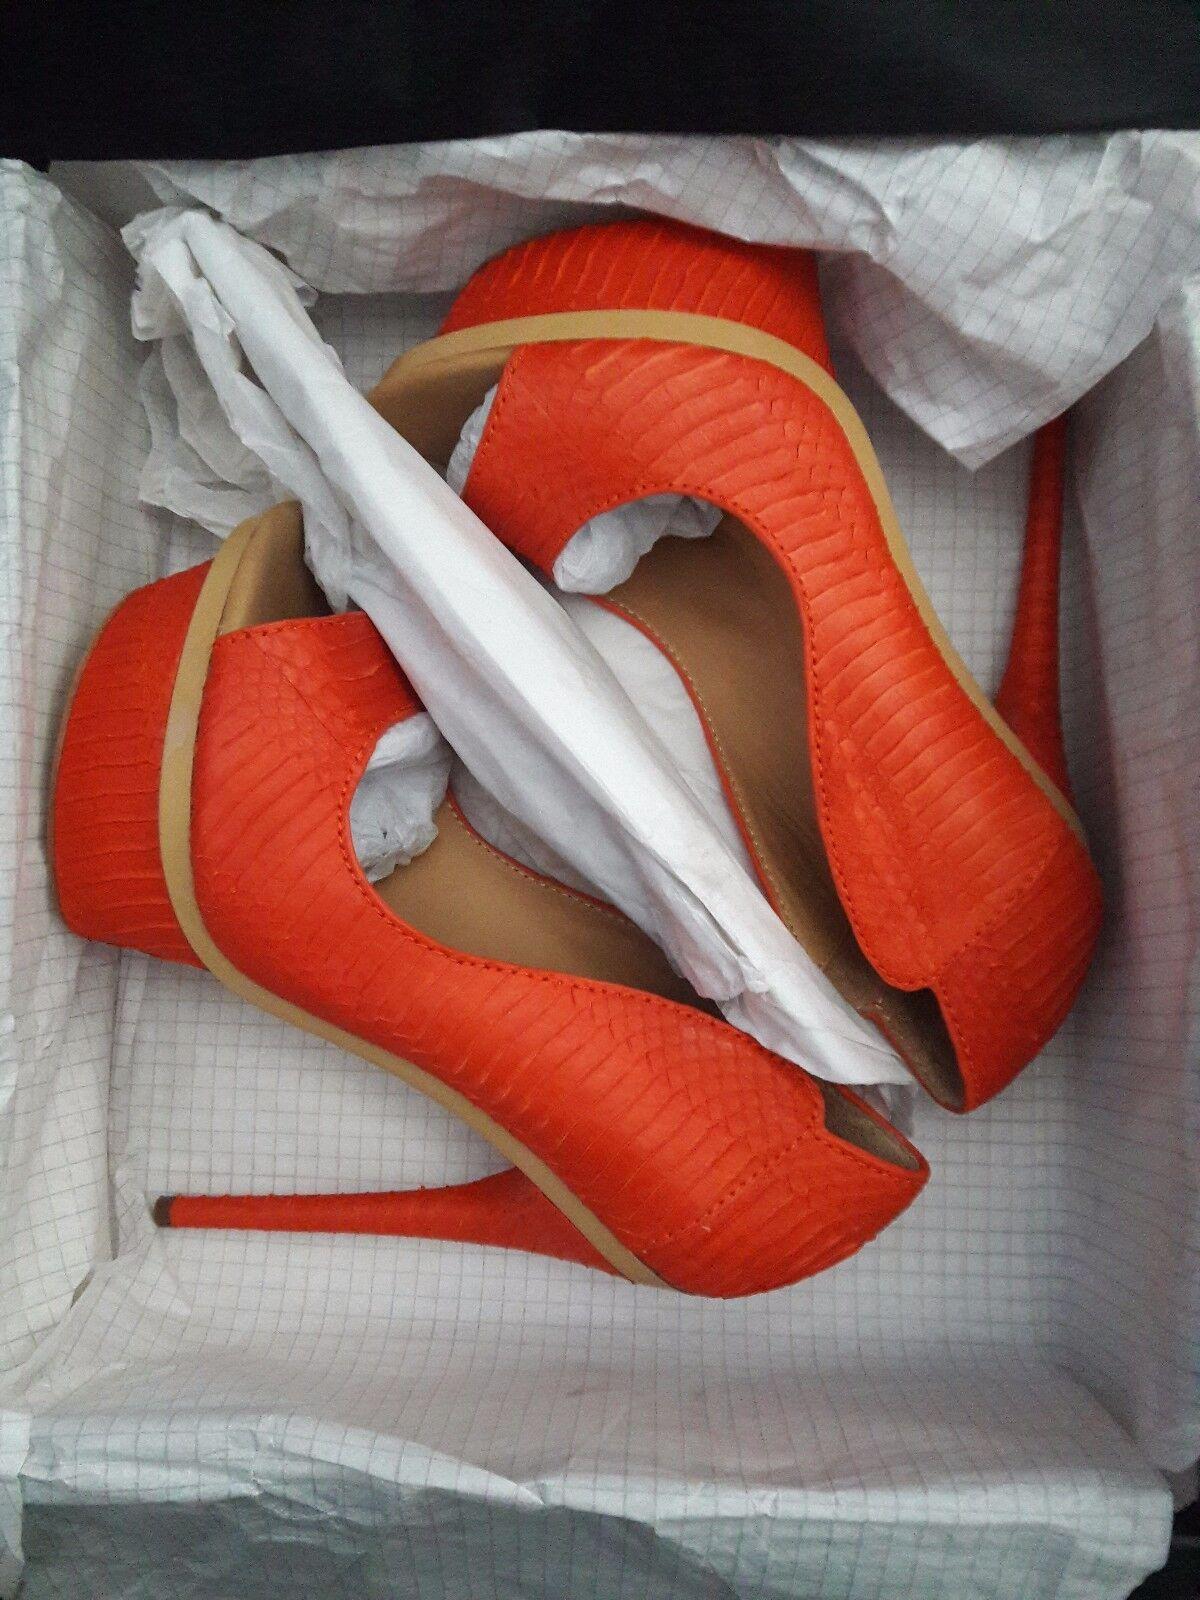 L.A.M.B. L.A.M.B. L.A.M.B. Ilane Coral Piel De Serpiente Cuero Peep Toe de salón con Plataforma Talla 8 97aa11